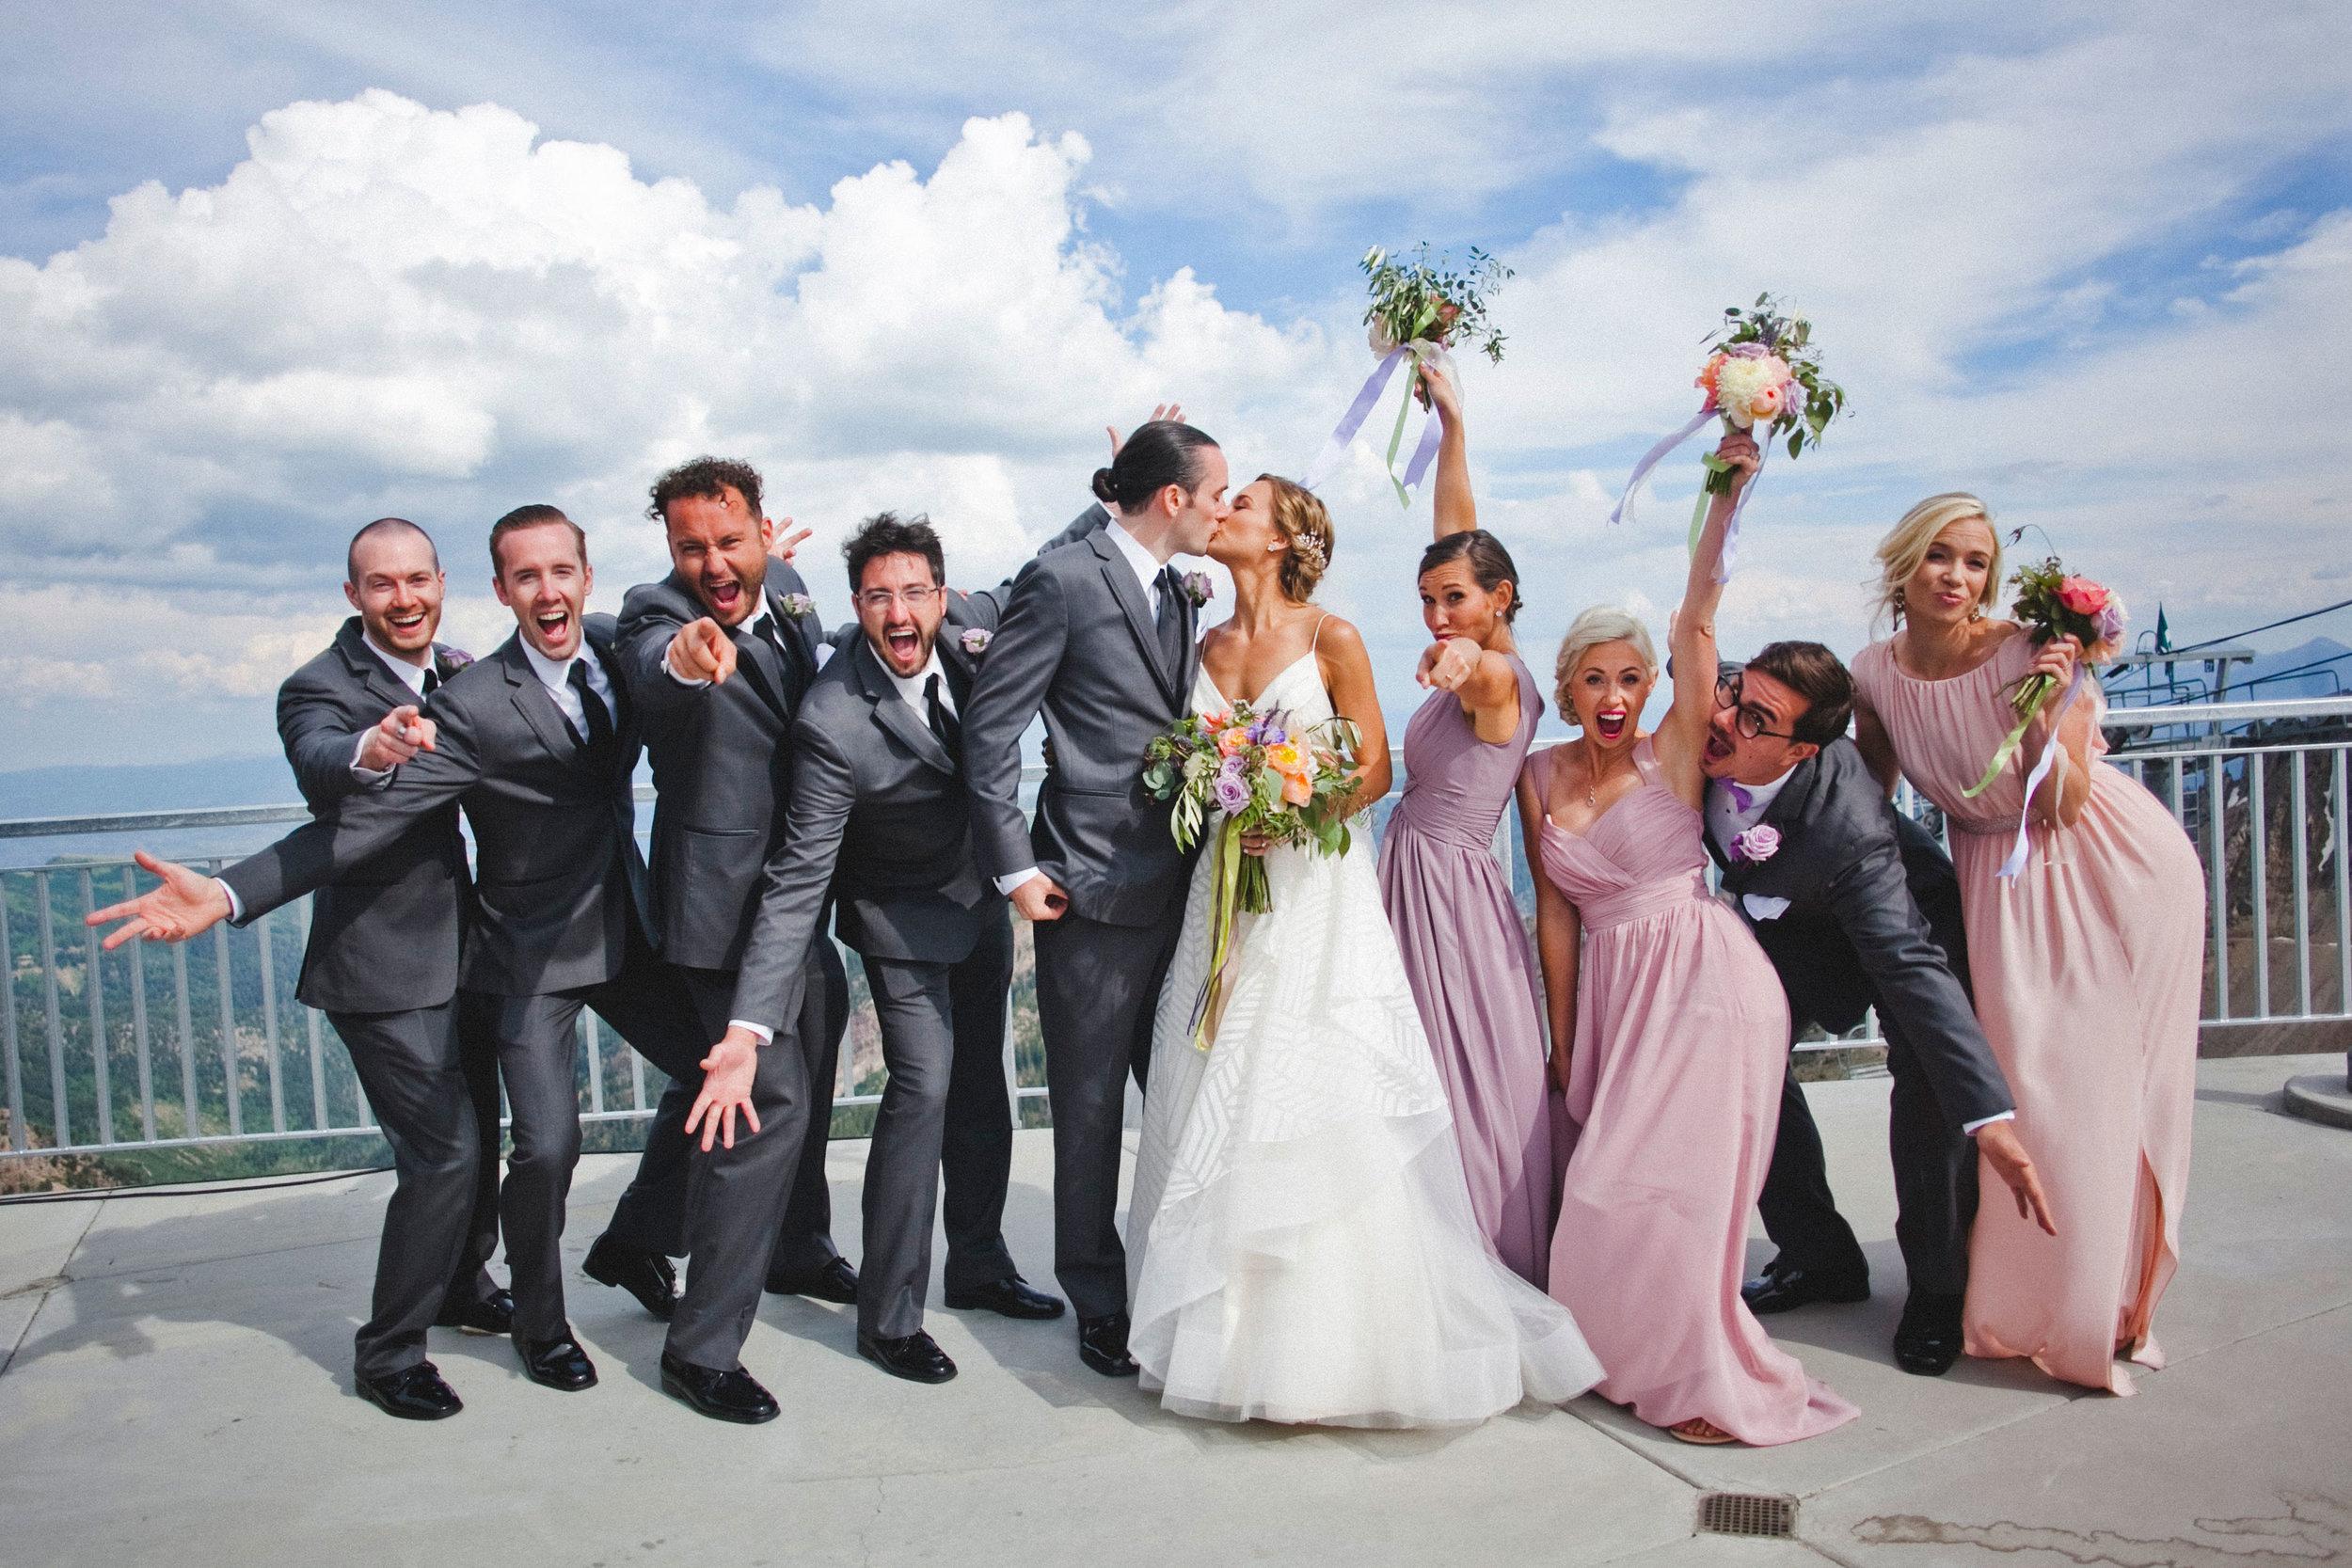 Weddings_Gina_Sean_0855.jpg